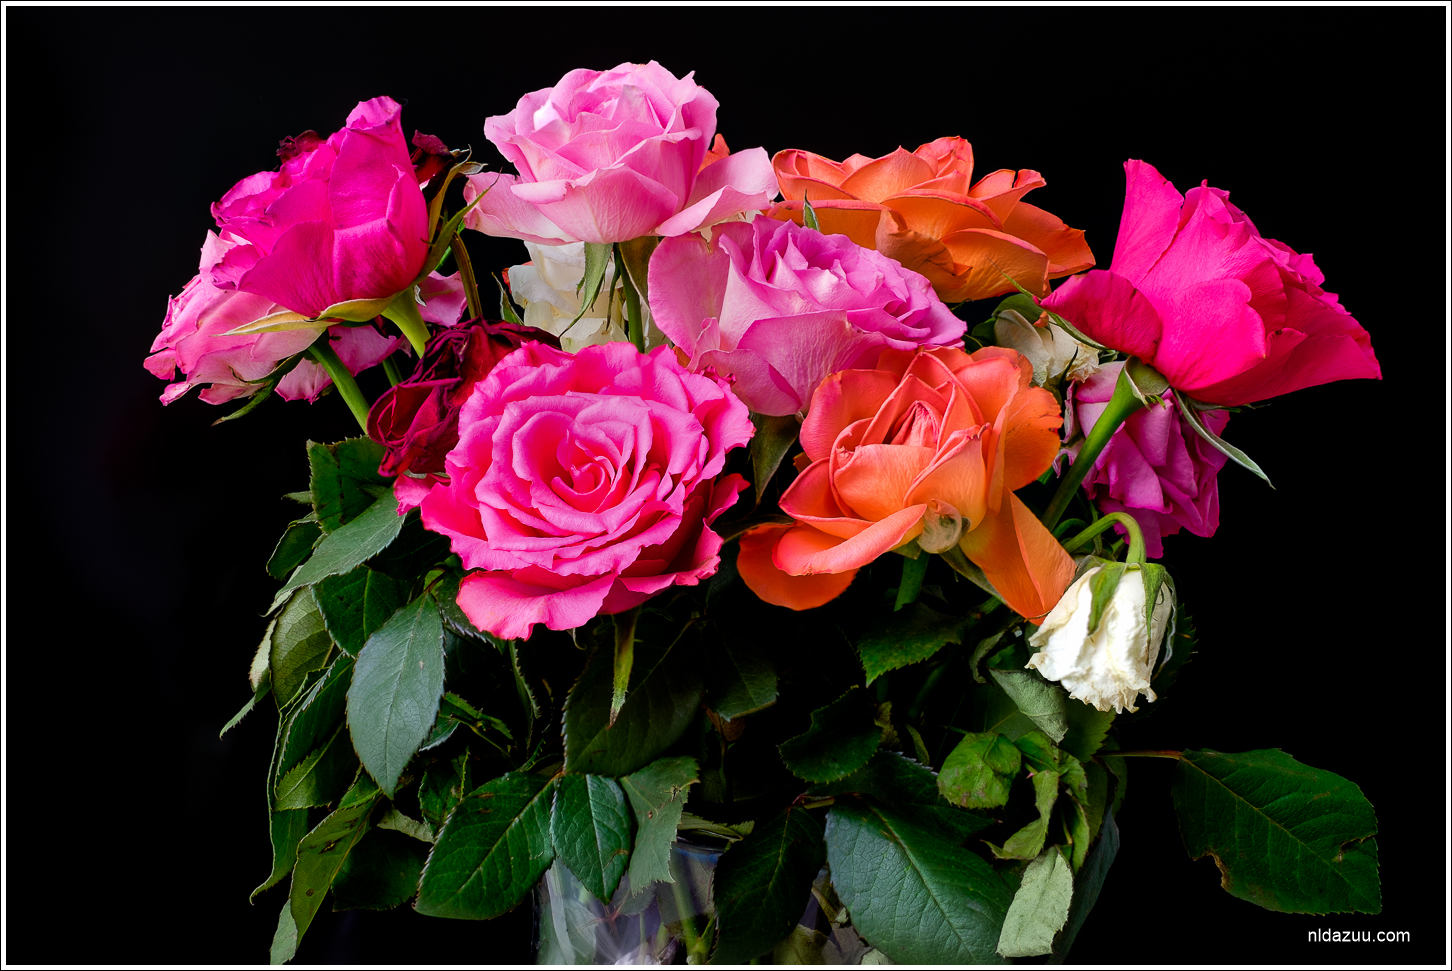 Foto7daagse, dag 1: Kleurig bosje bloemen